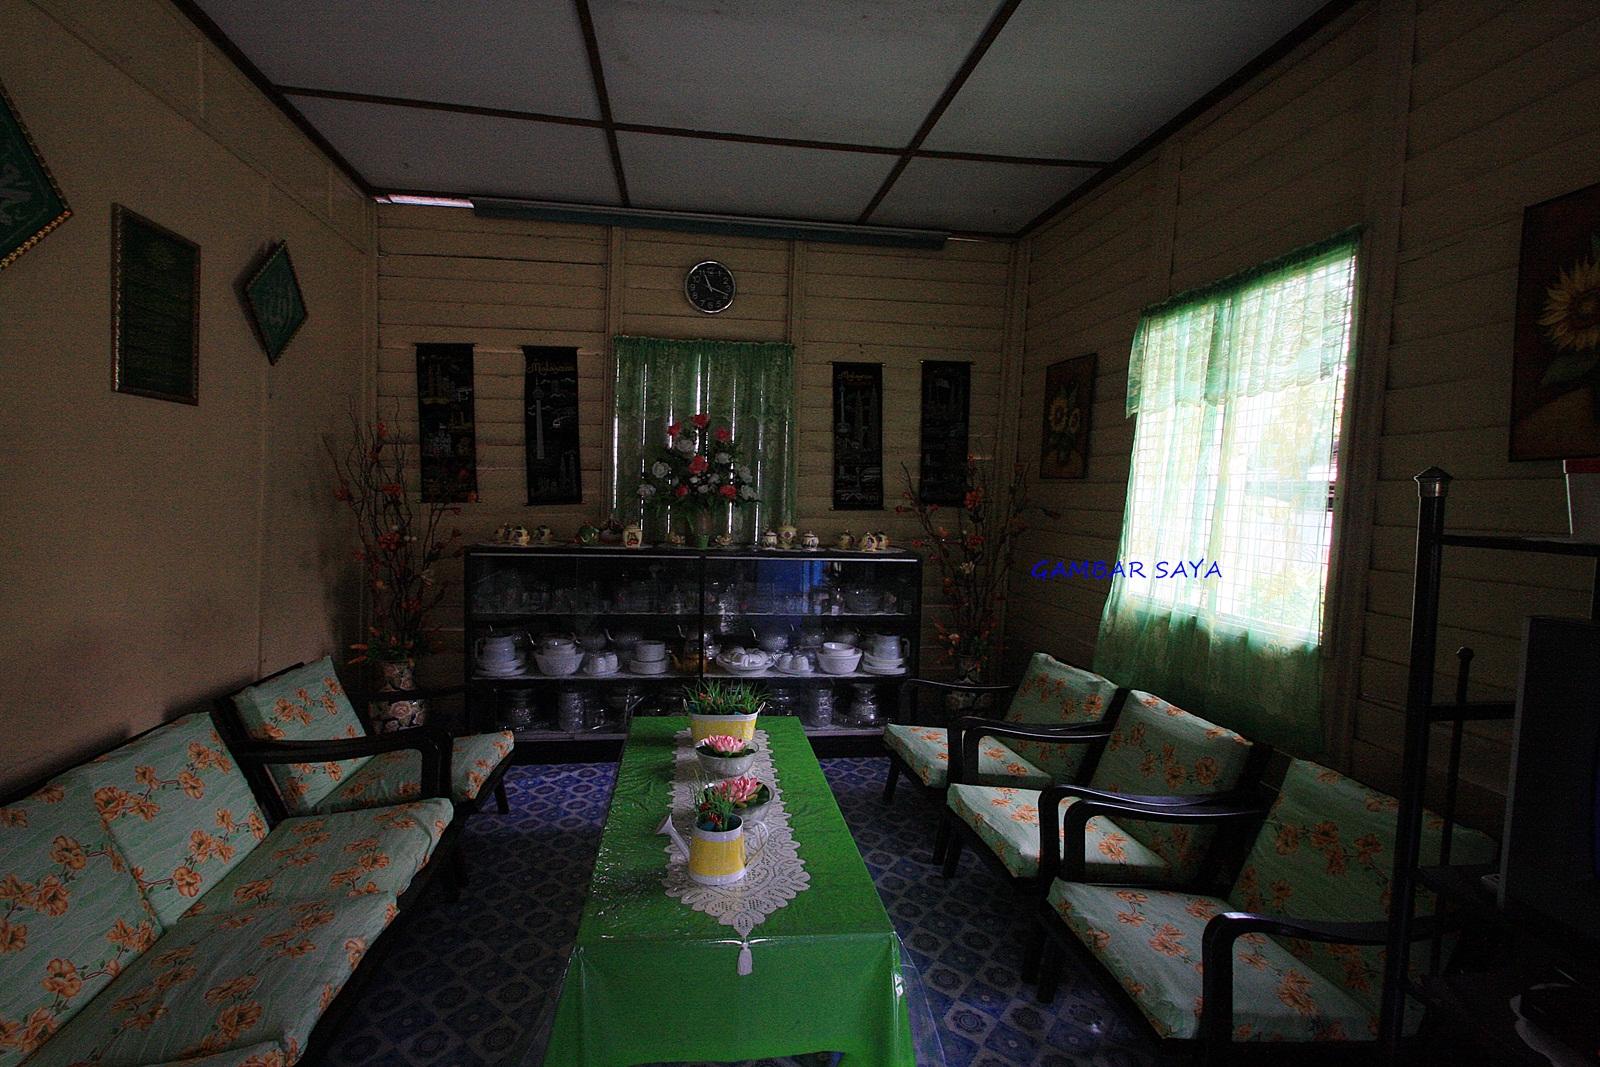 Gambar Gambar Hiasan Ruang Tamu Rumah Kampung Dream Home